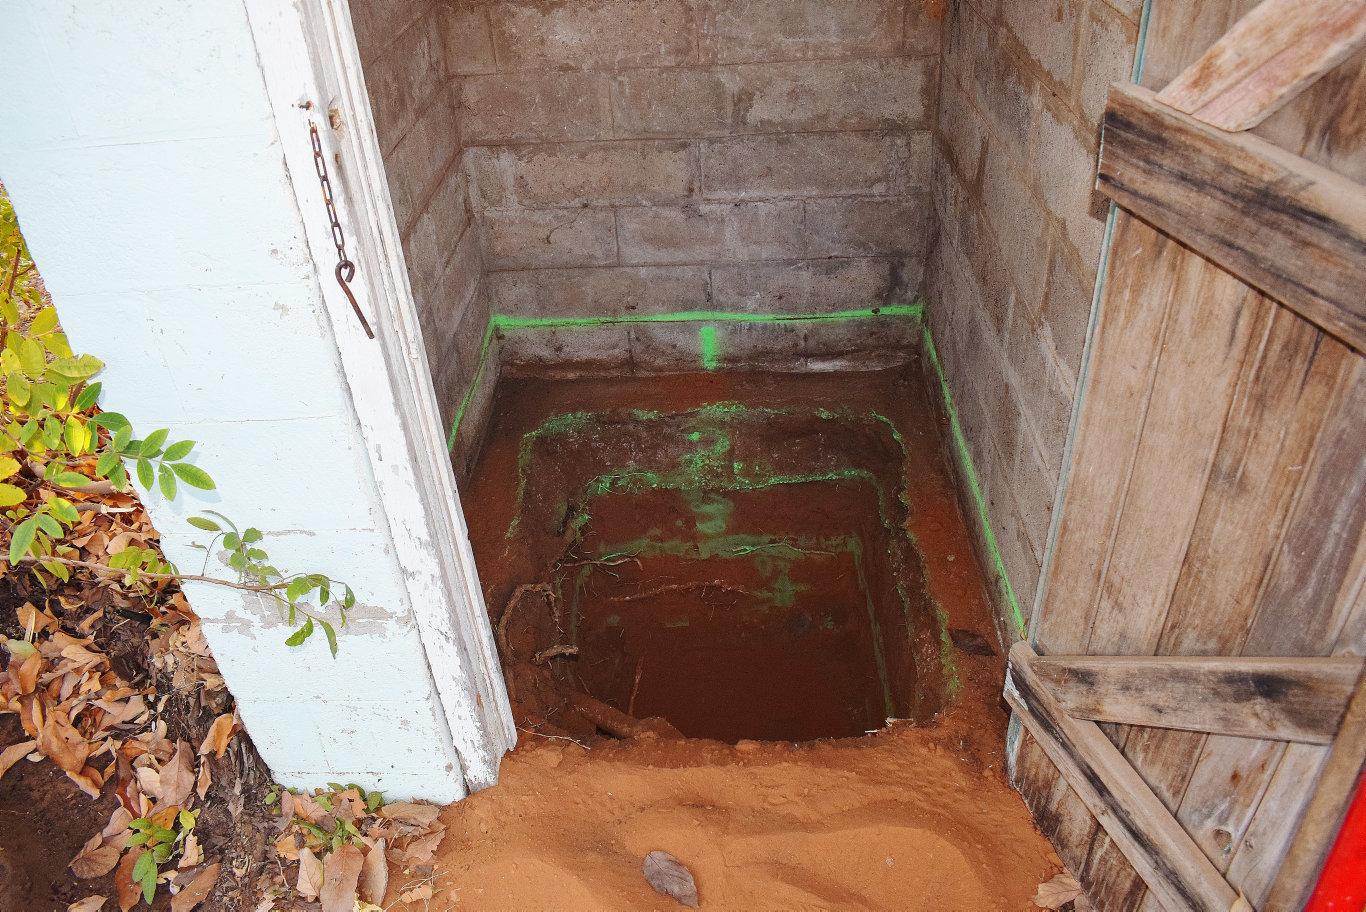 Chinchilla backyard investigation